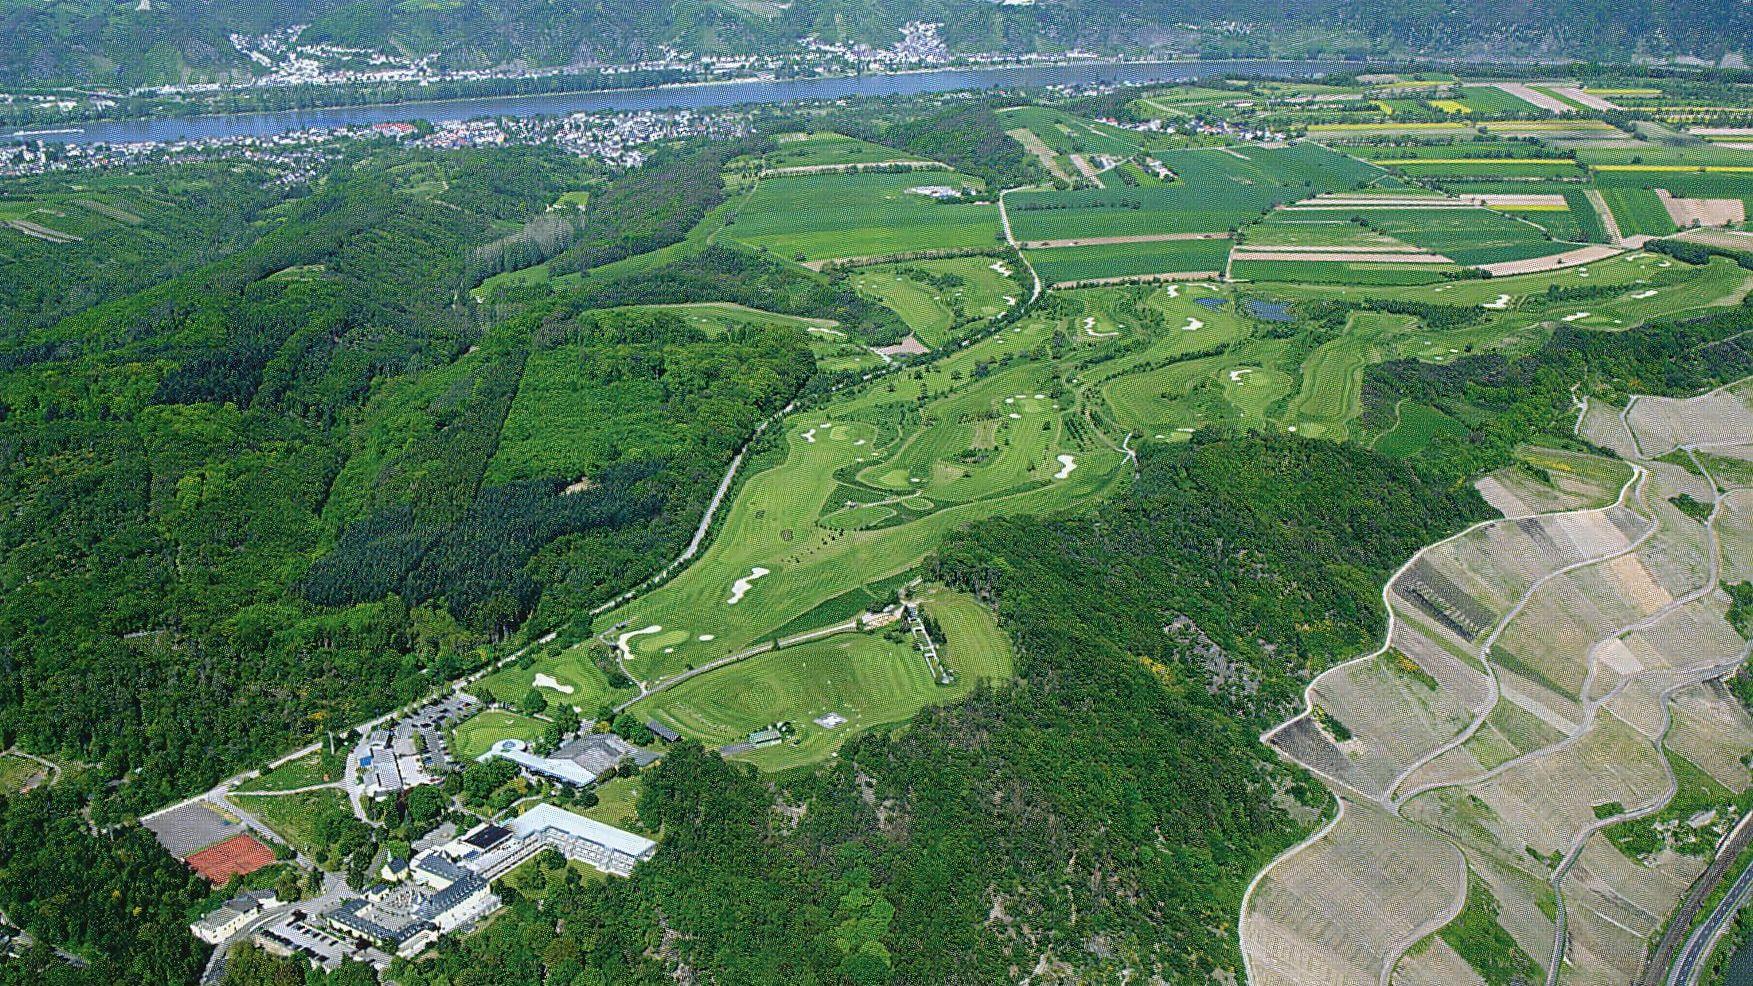 Golfplatz in Boppard/Rhens